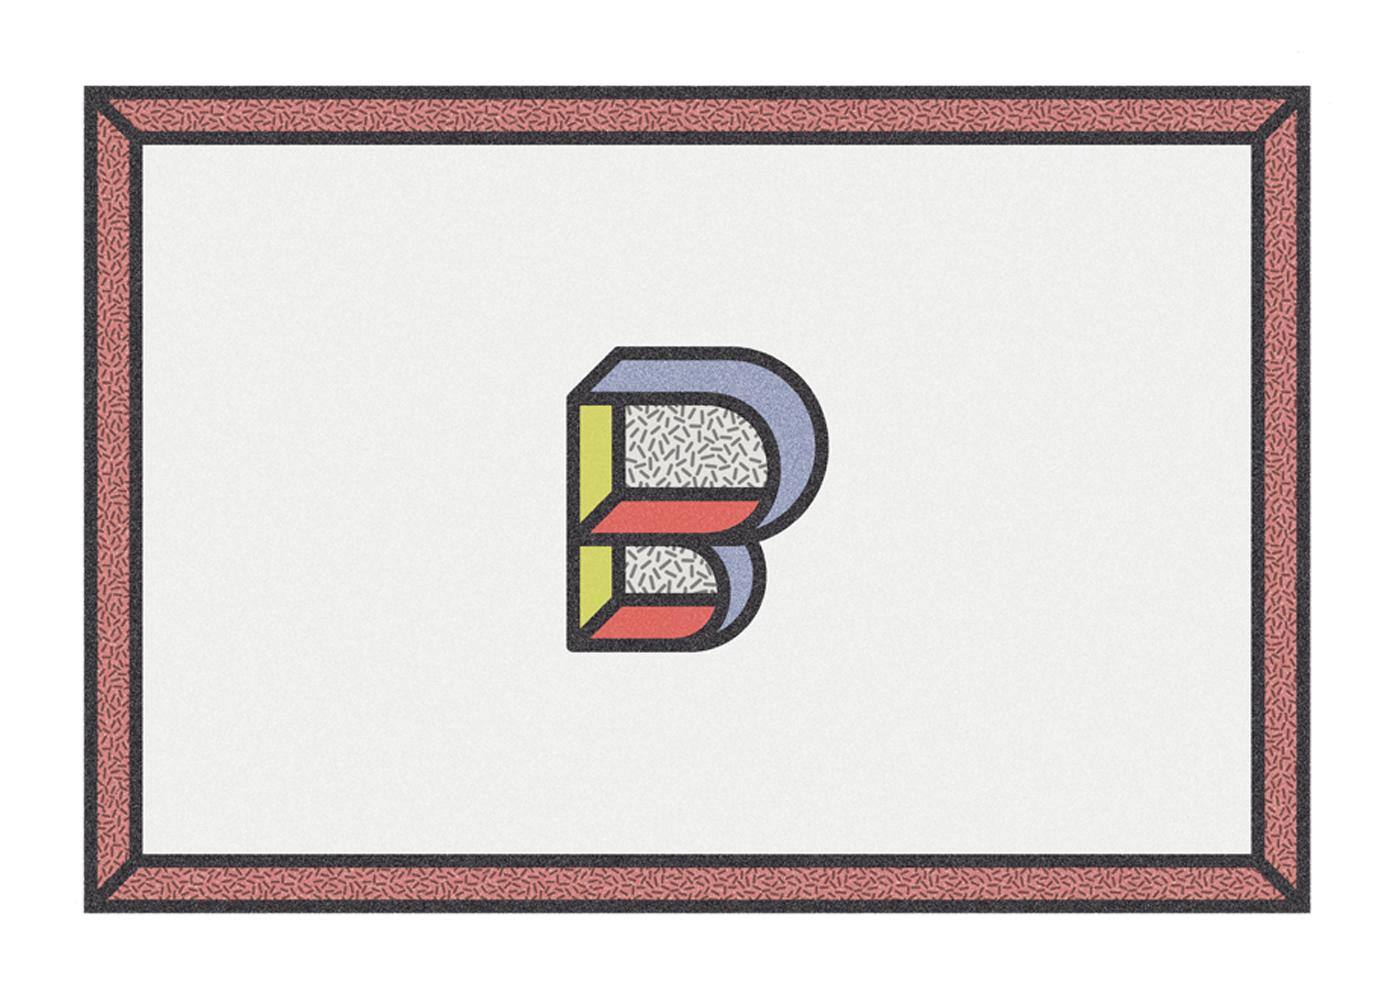 alphabet,36daysoftype,Typeface,lettering,letter,number,Numerology,type,vector,vectorart,artwork,ilustracion,tipografia,numerologia,pablotradacete